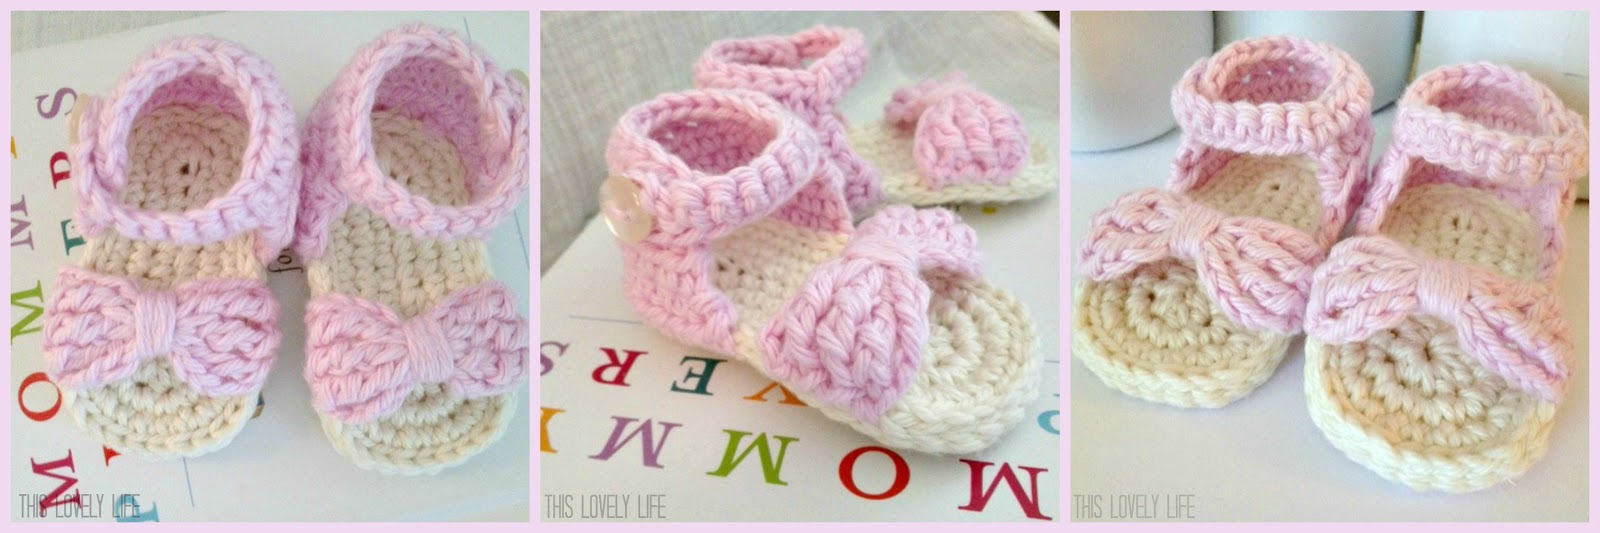 Easy Baby Sandals Crochet Pattern Free : Crochet Baby Sandals